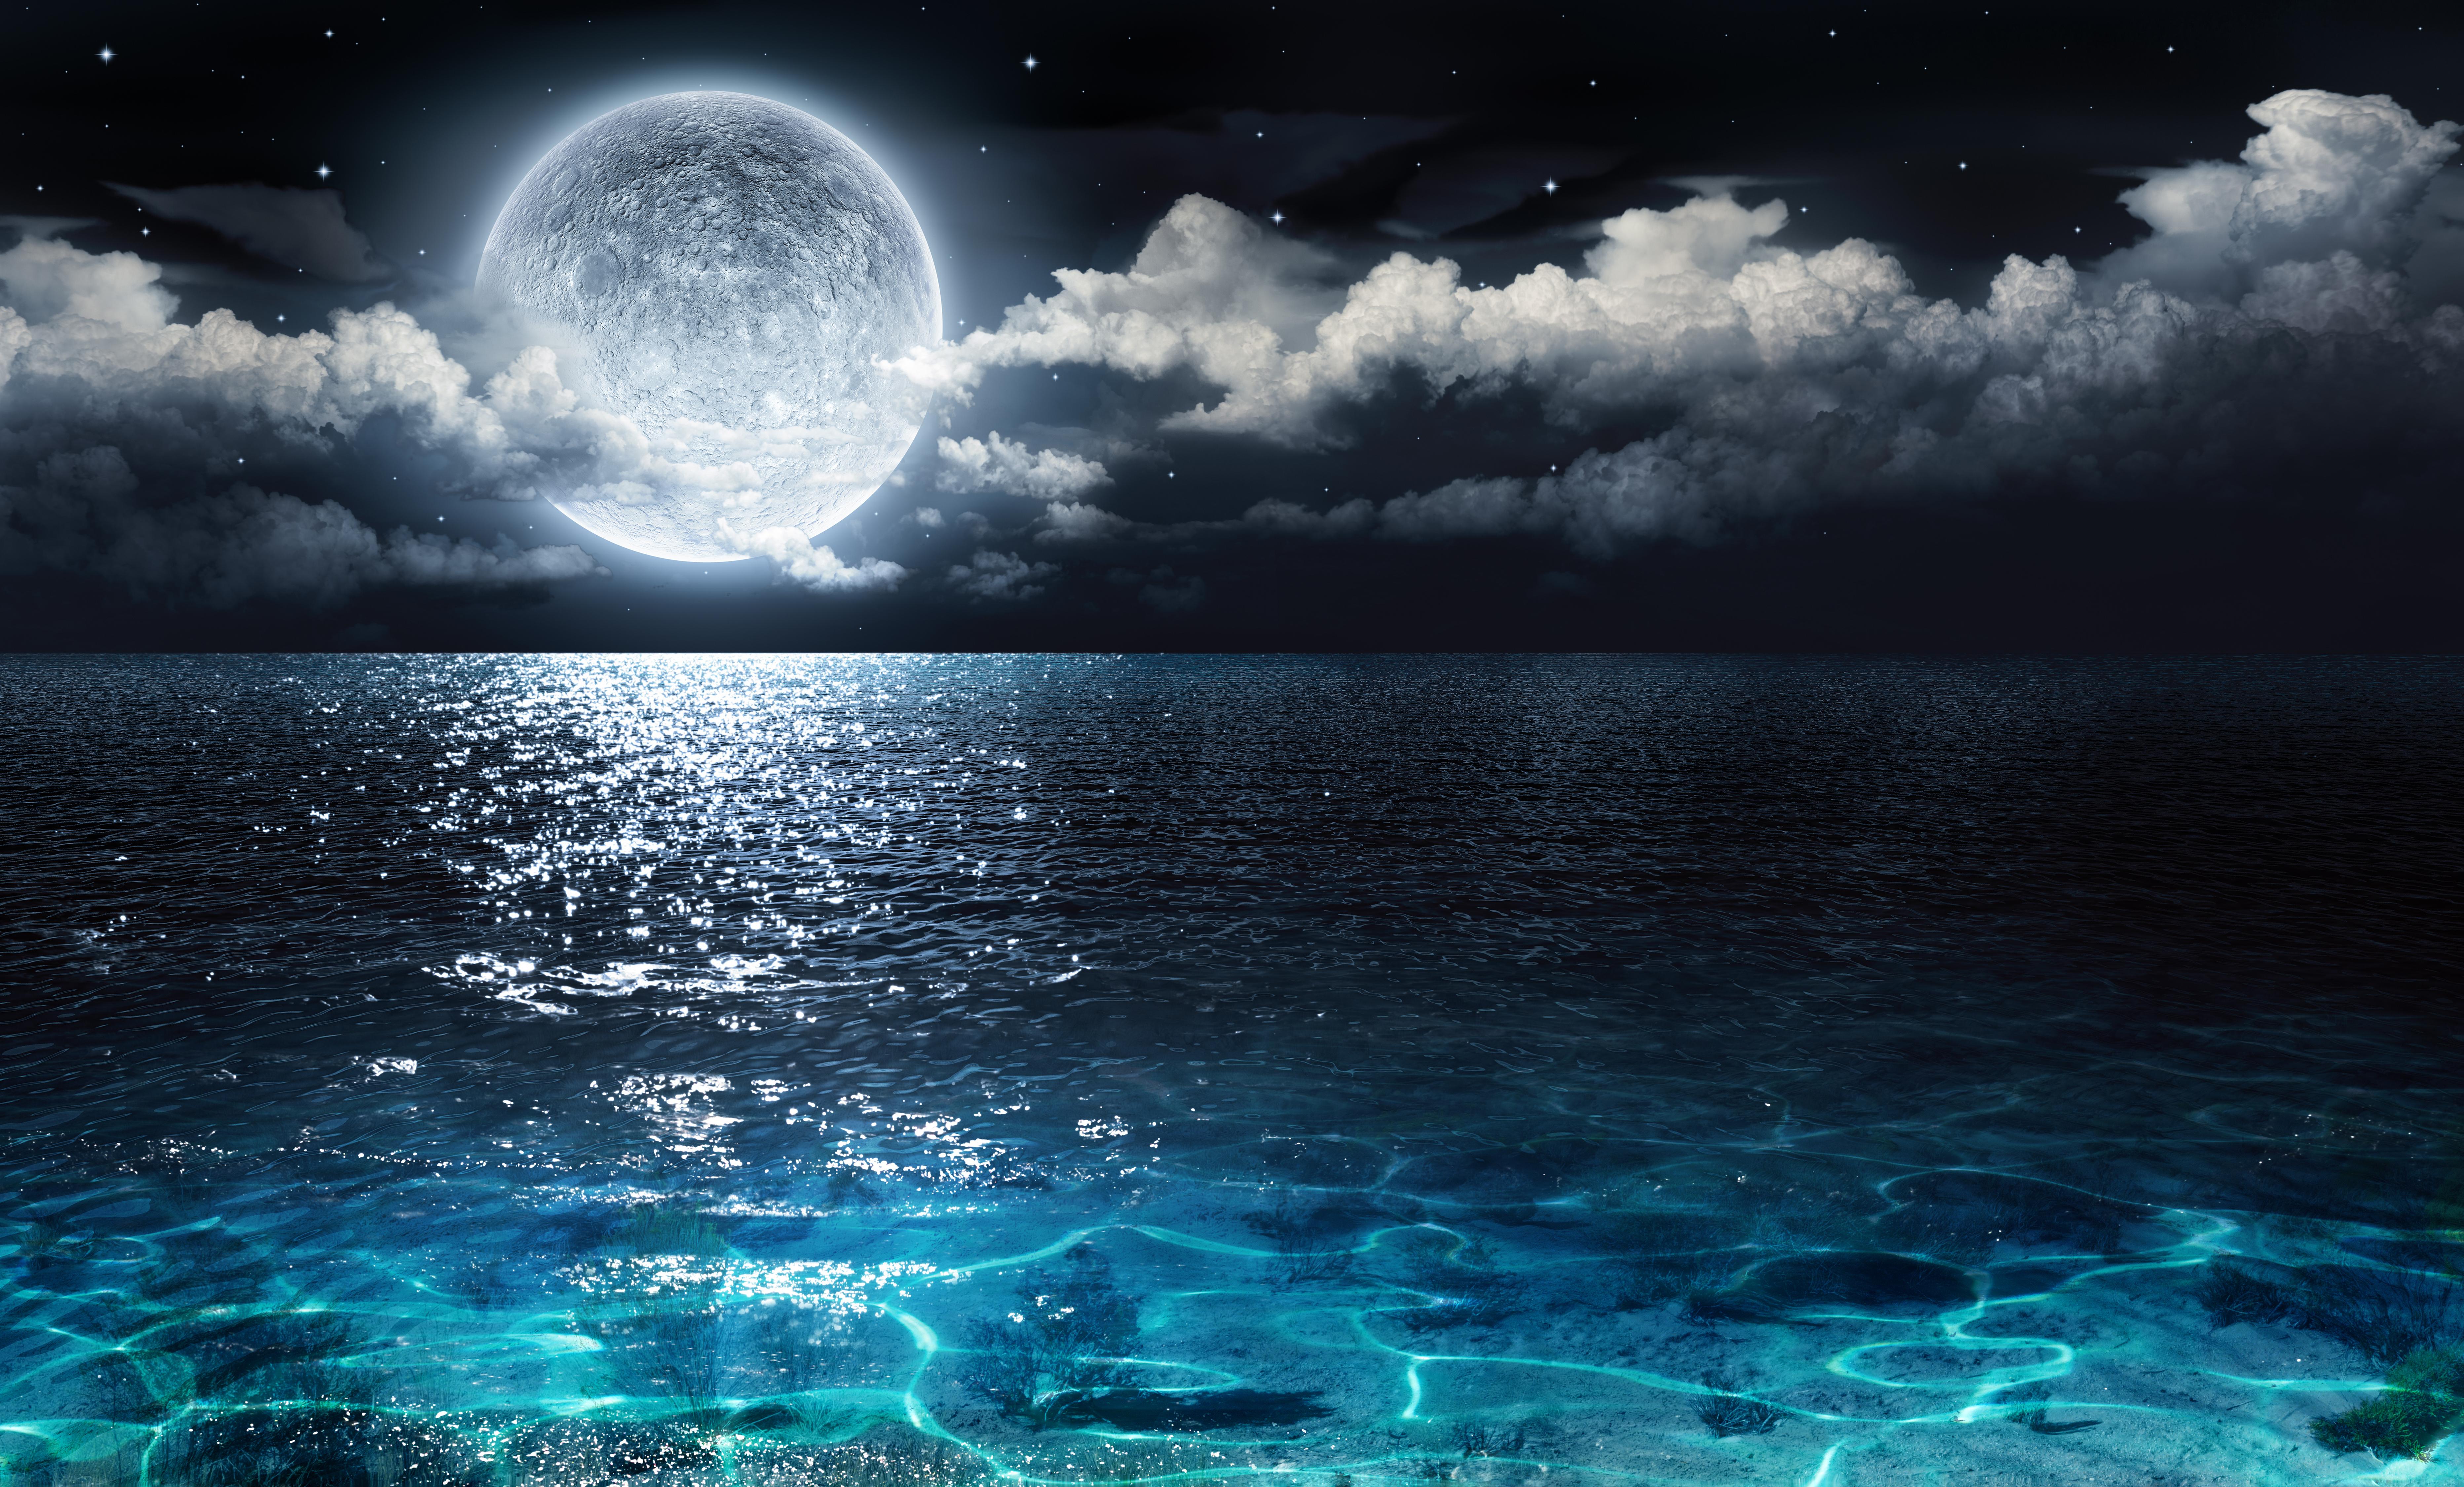 Картинка: Ночь, луна, море, звезды, облака, 3D